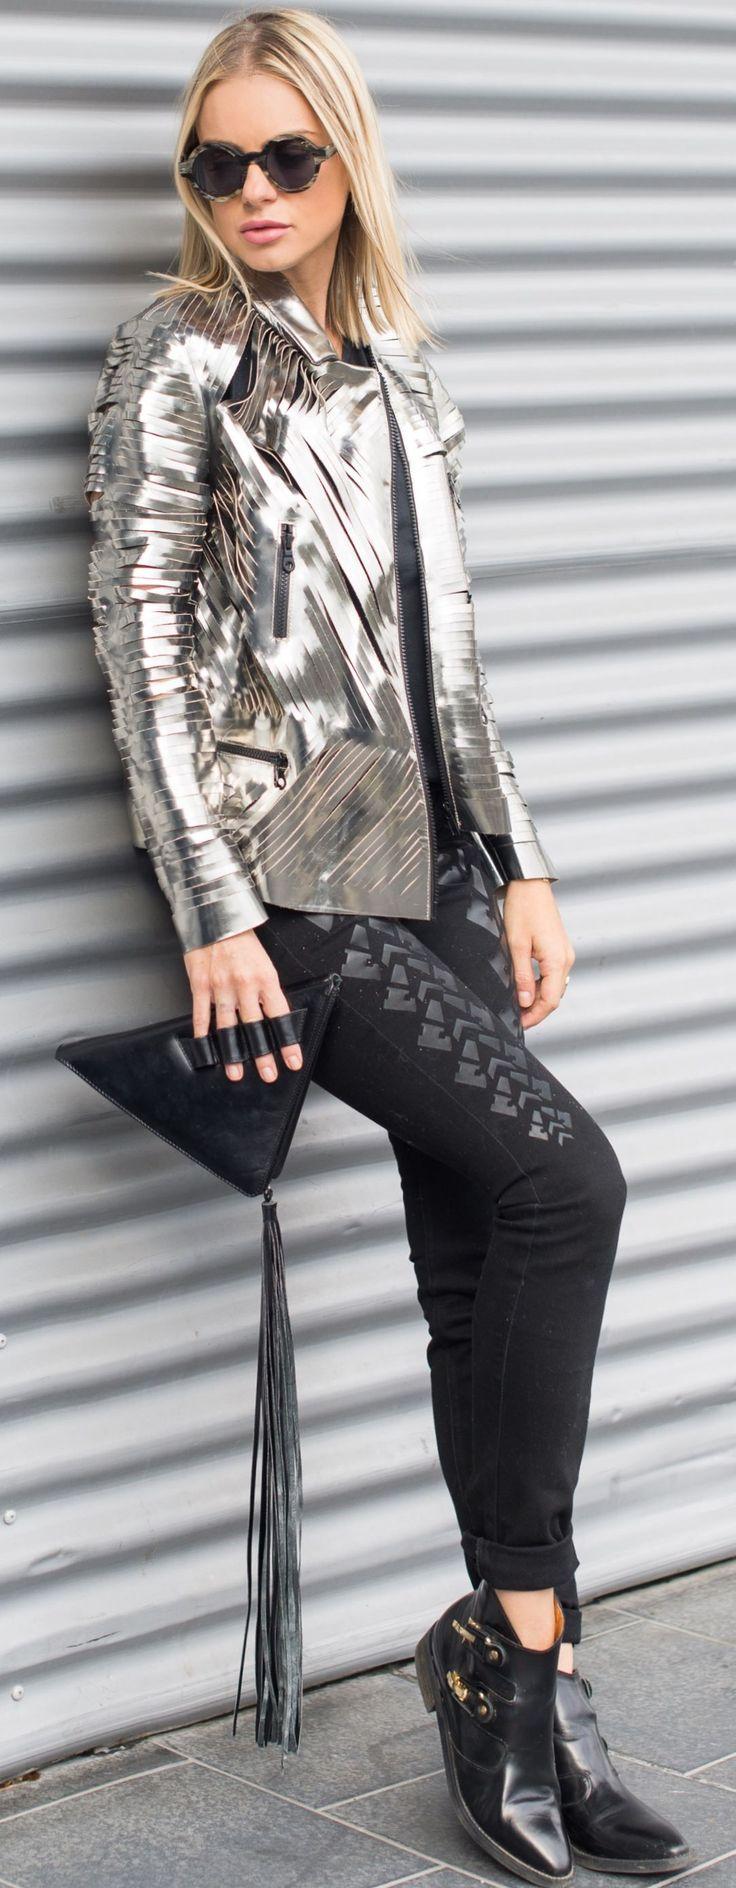 Catalina Grama Metallic Silver Creation Jacket Fall Inspo #Fashionistas By Nayia Ginn